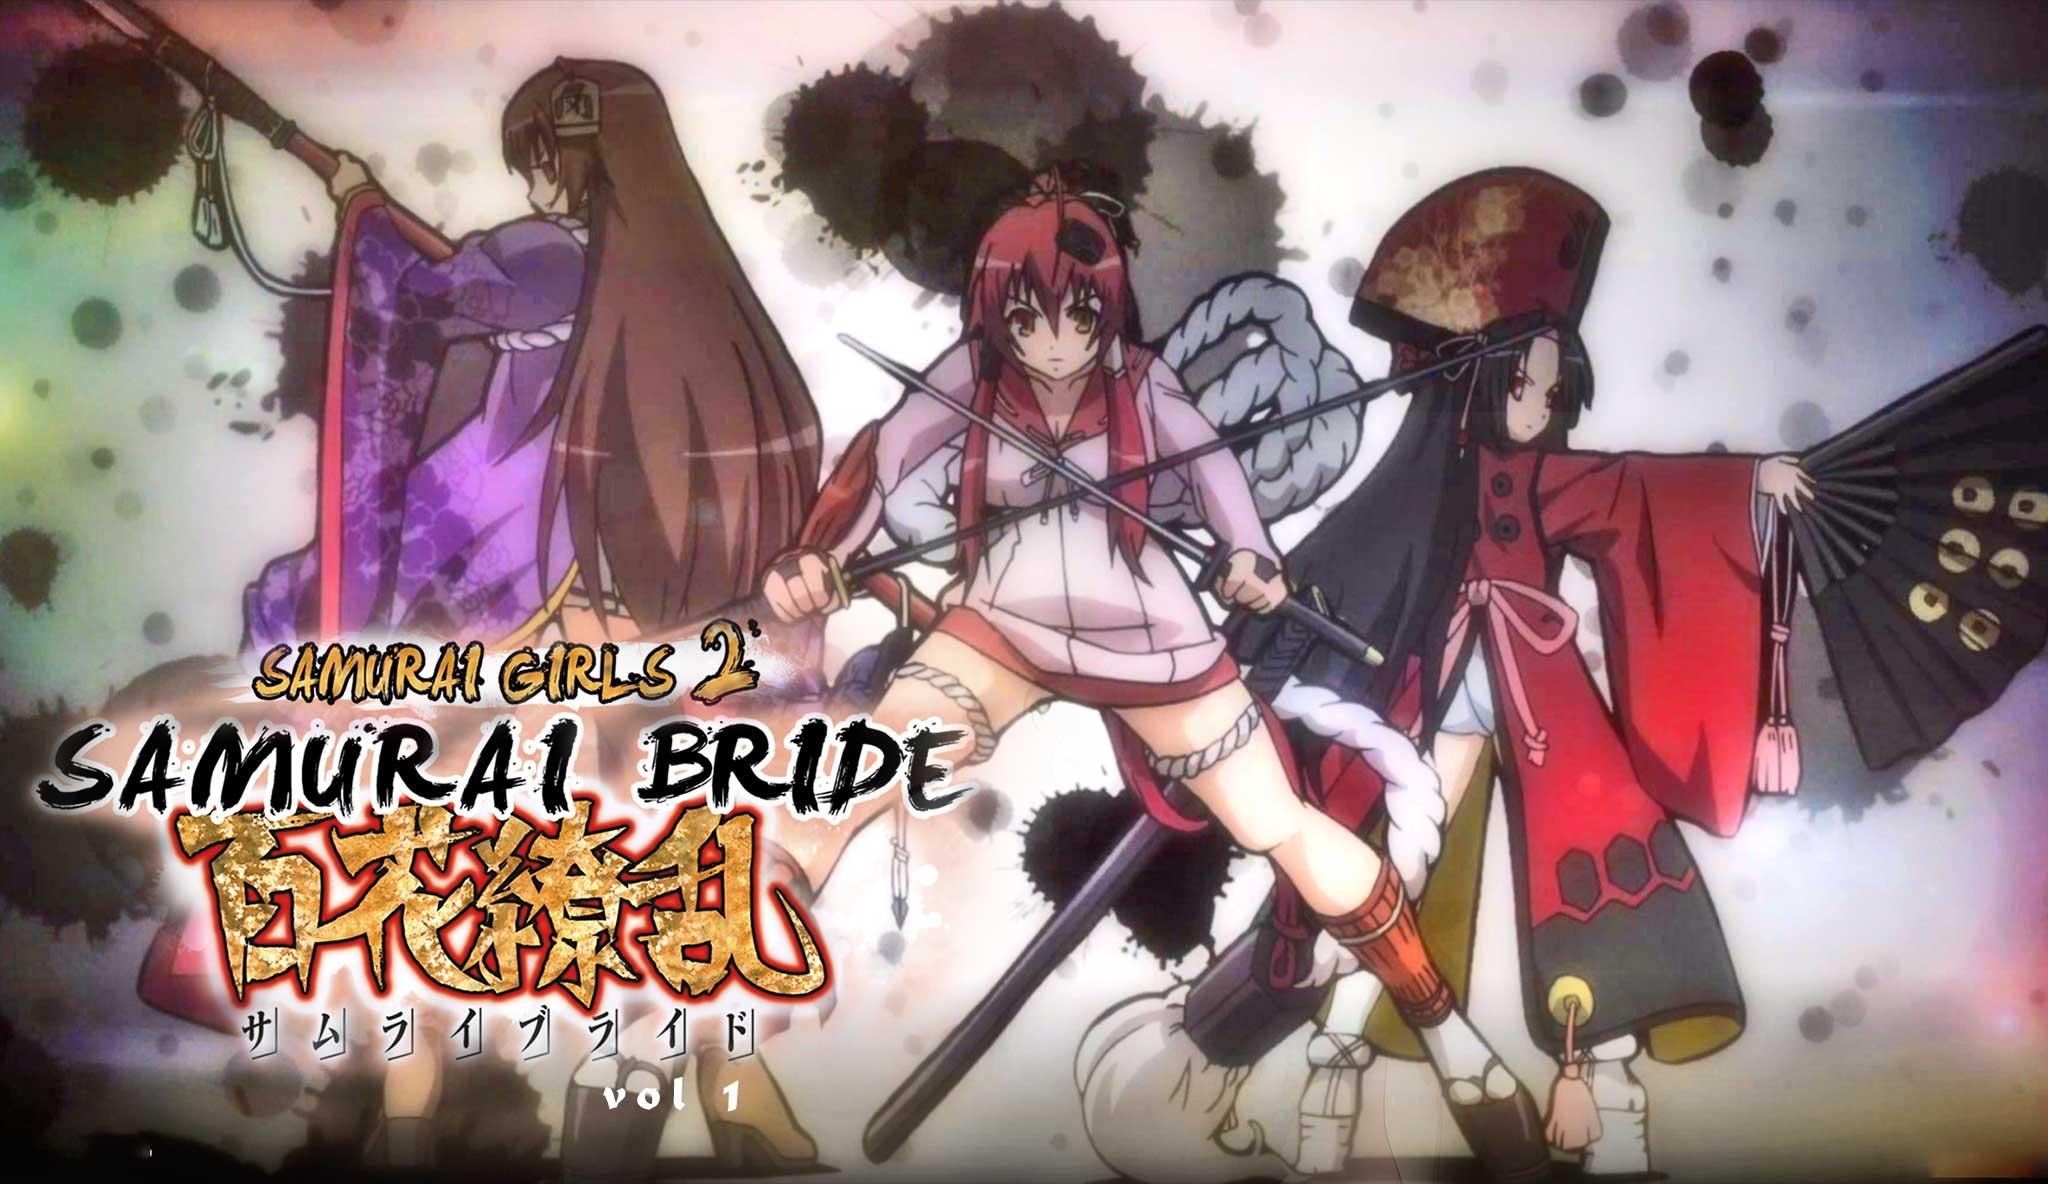 samurai-girls-2-samurai-bride-episode-1-3\header.jpg